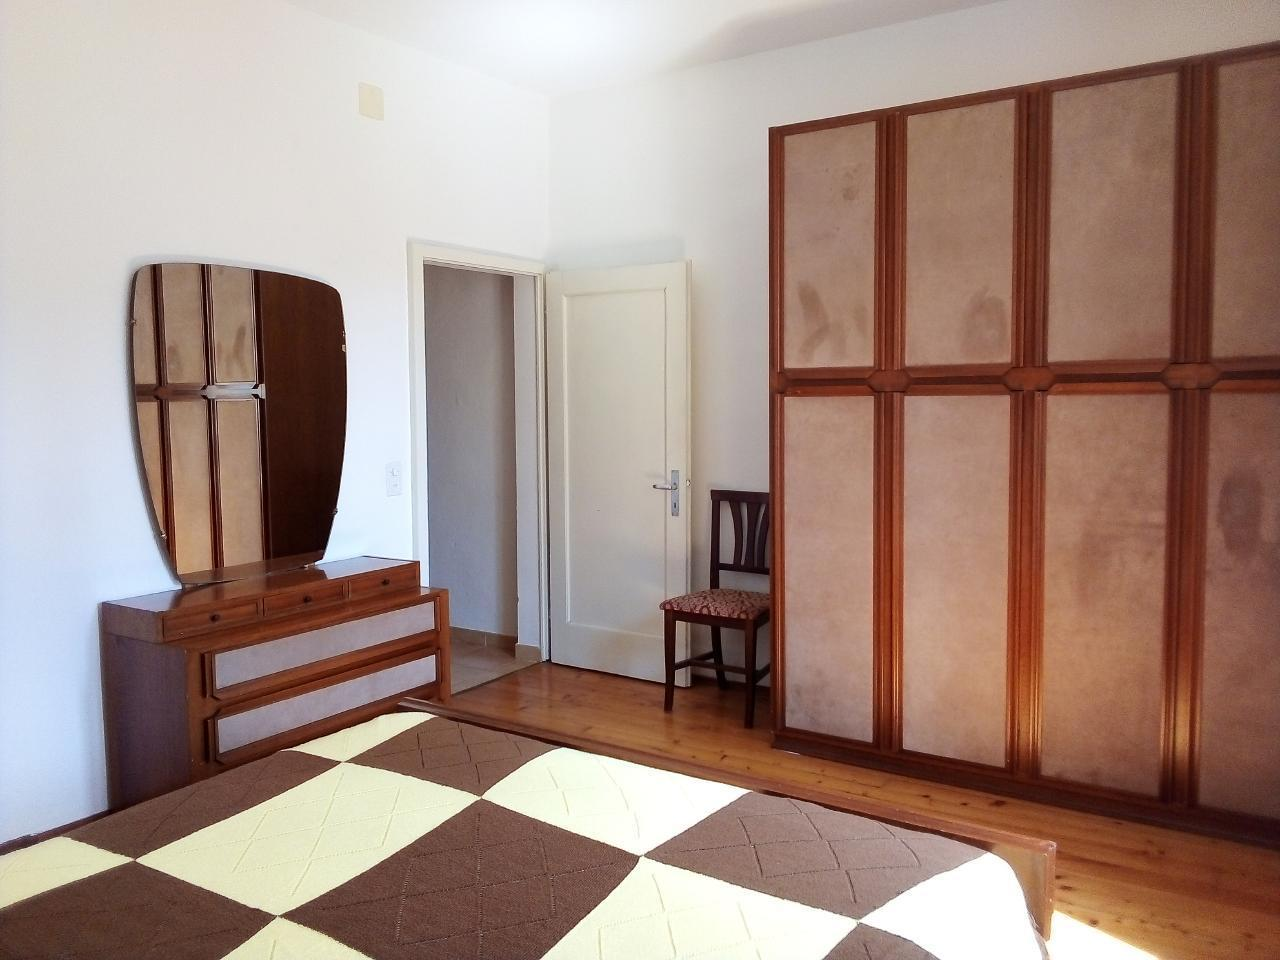 Appartement de vacances Grosszügige Wohnung im historischen Tessinerhaus (2617724), Sessa, Lac de Lugano (CH), Tessin, Suisse, image 6